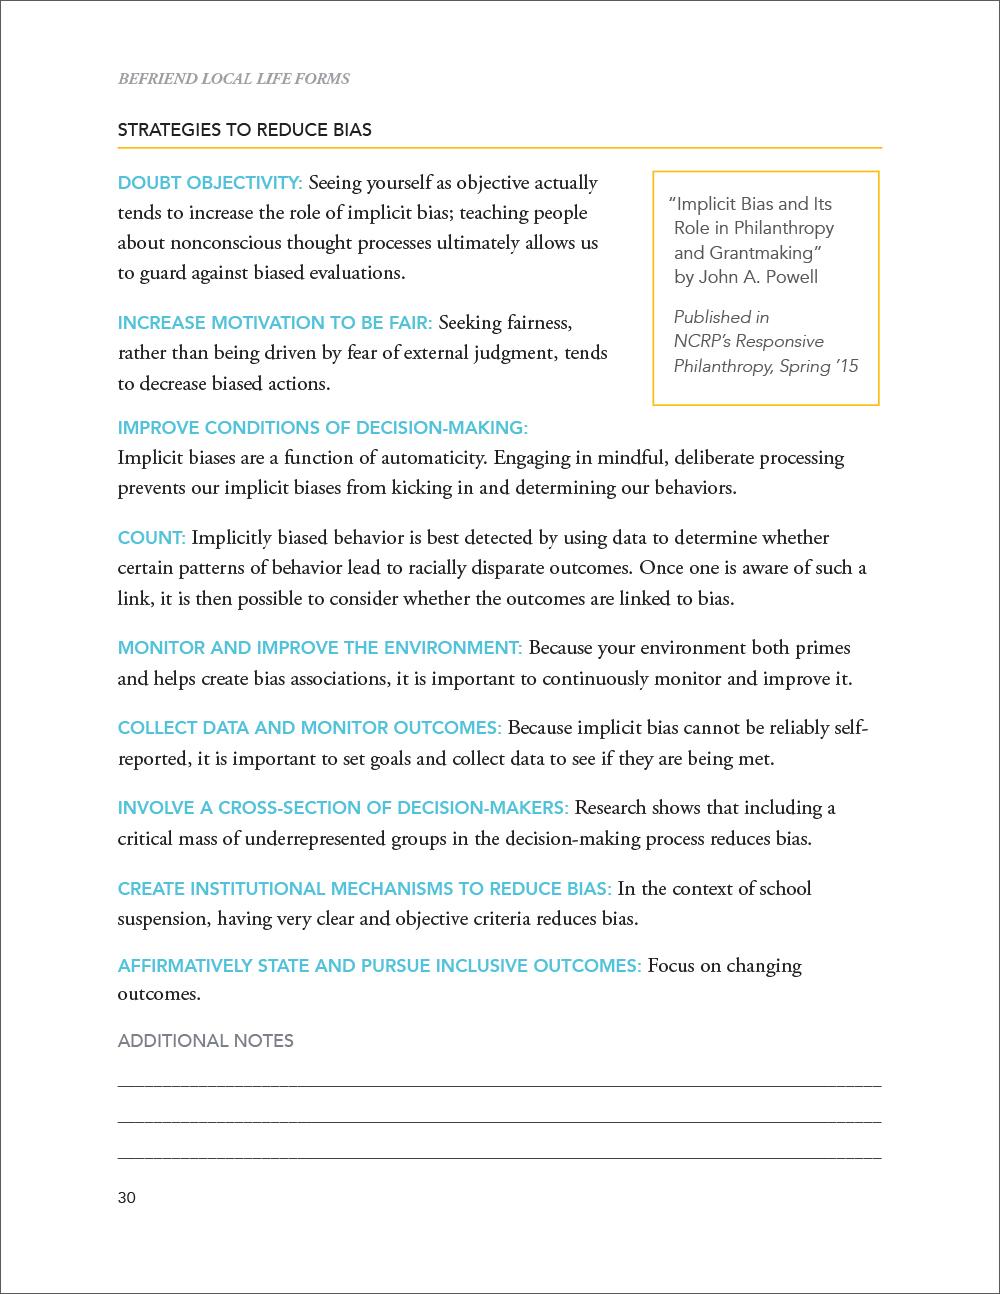 MNA-GuideToTheGalaxy-Workbook-30.jpg